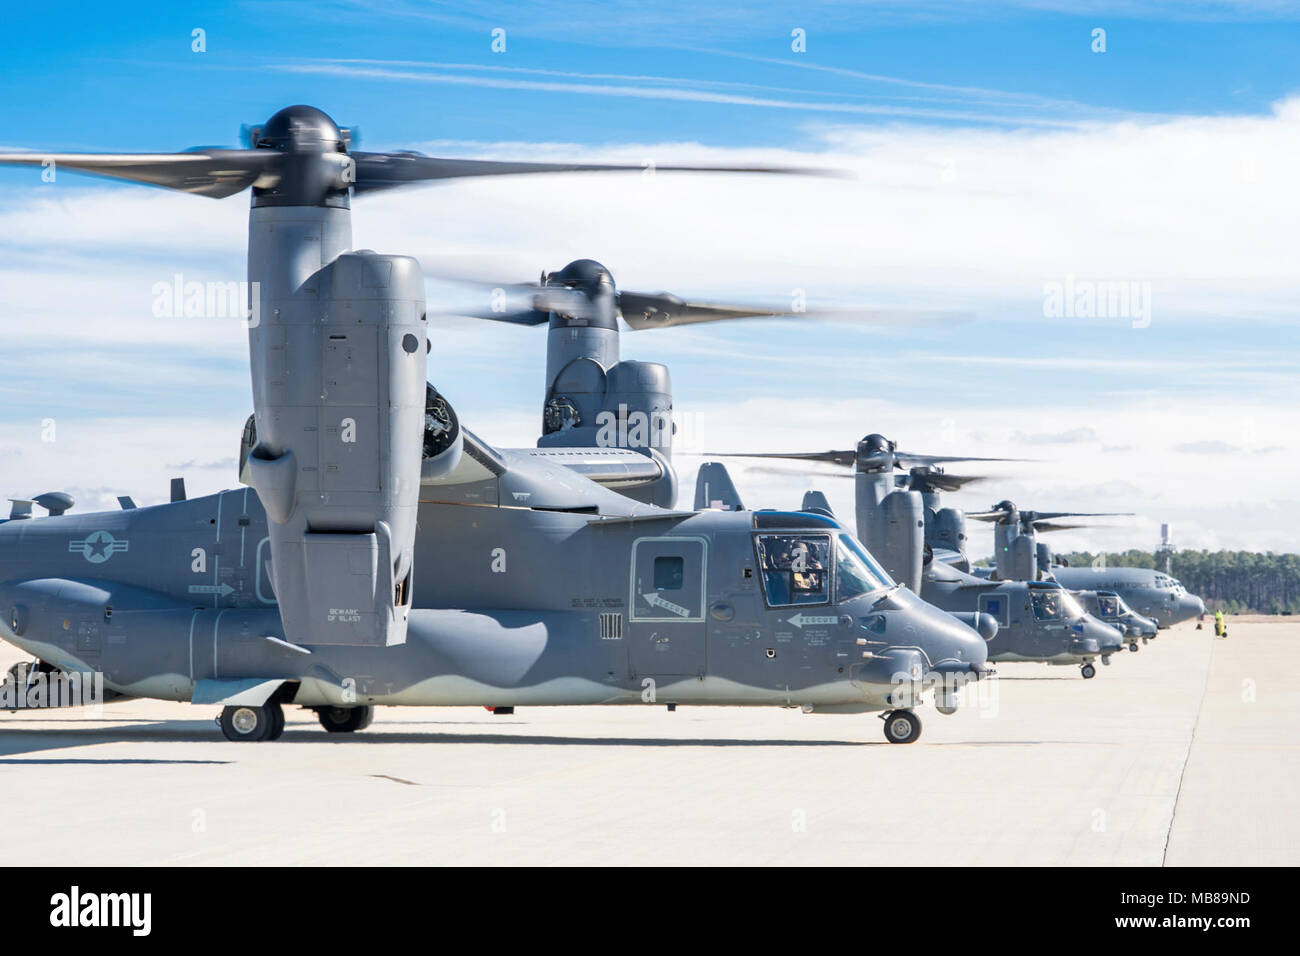 U 58 Stock Photos Images Page 42 Alamy V 22 Osprey Engine Diagram Pope Army Airfield Nc A Trio Of Air Force Cv Aircraft